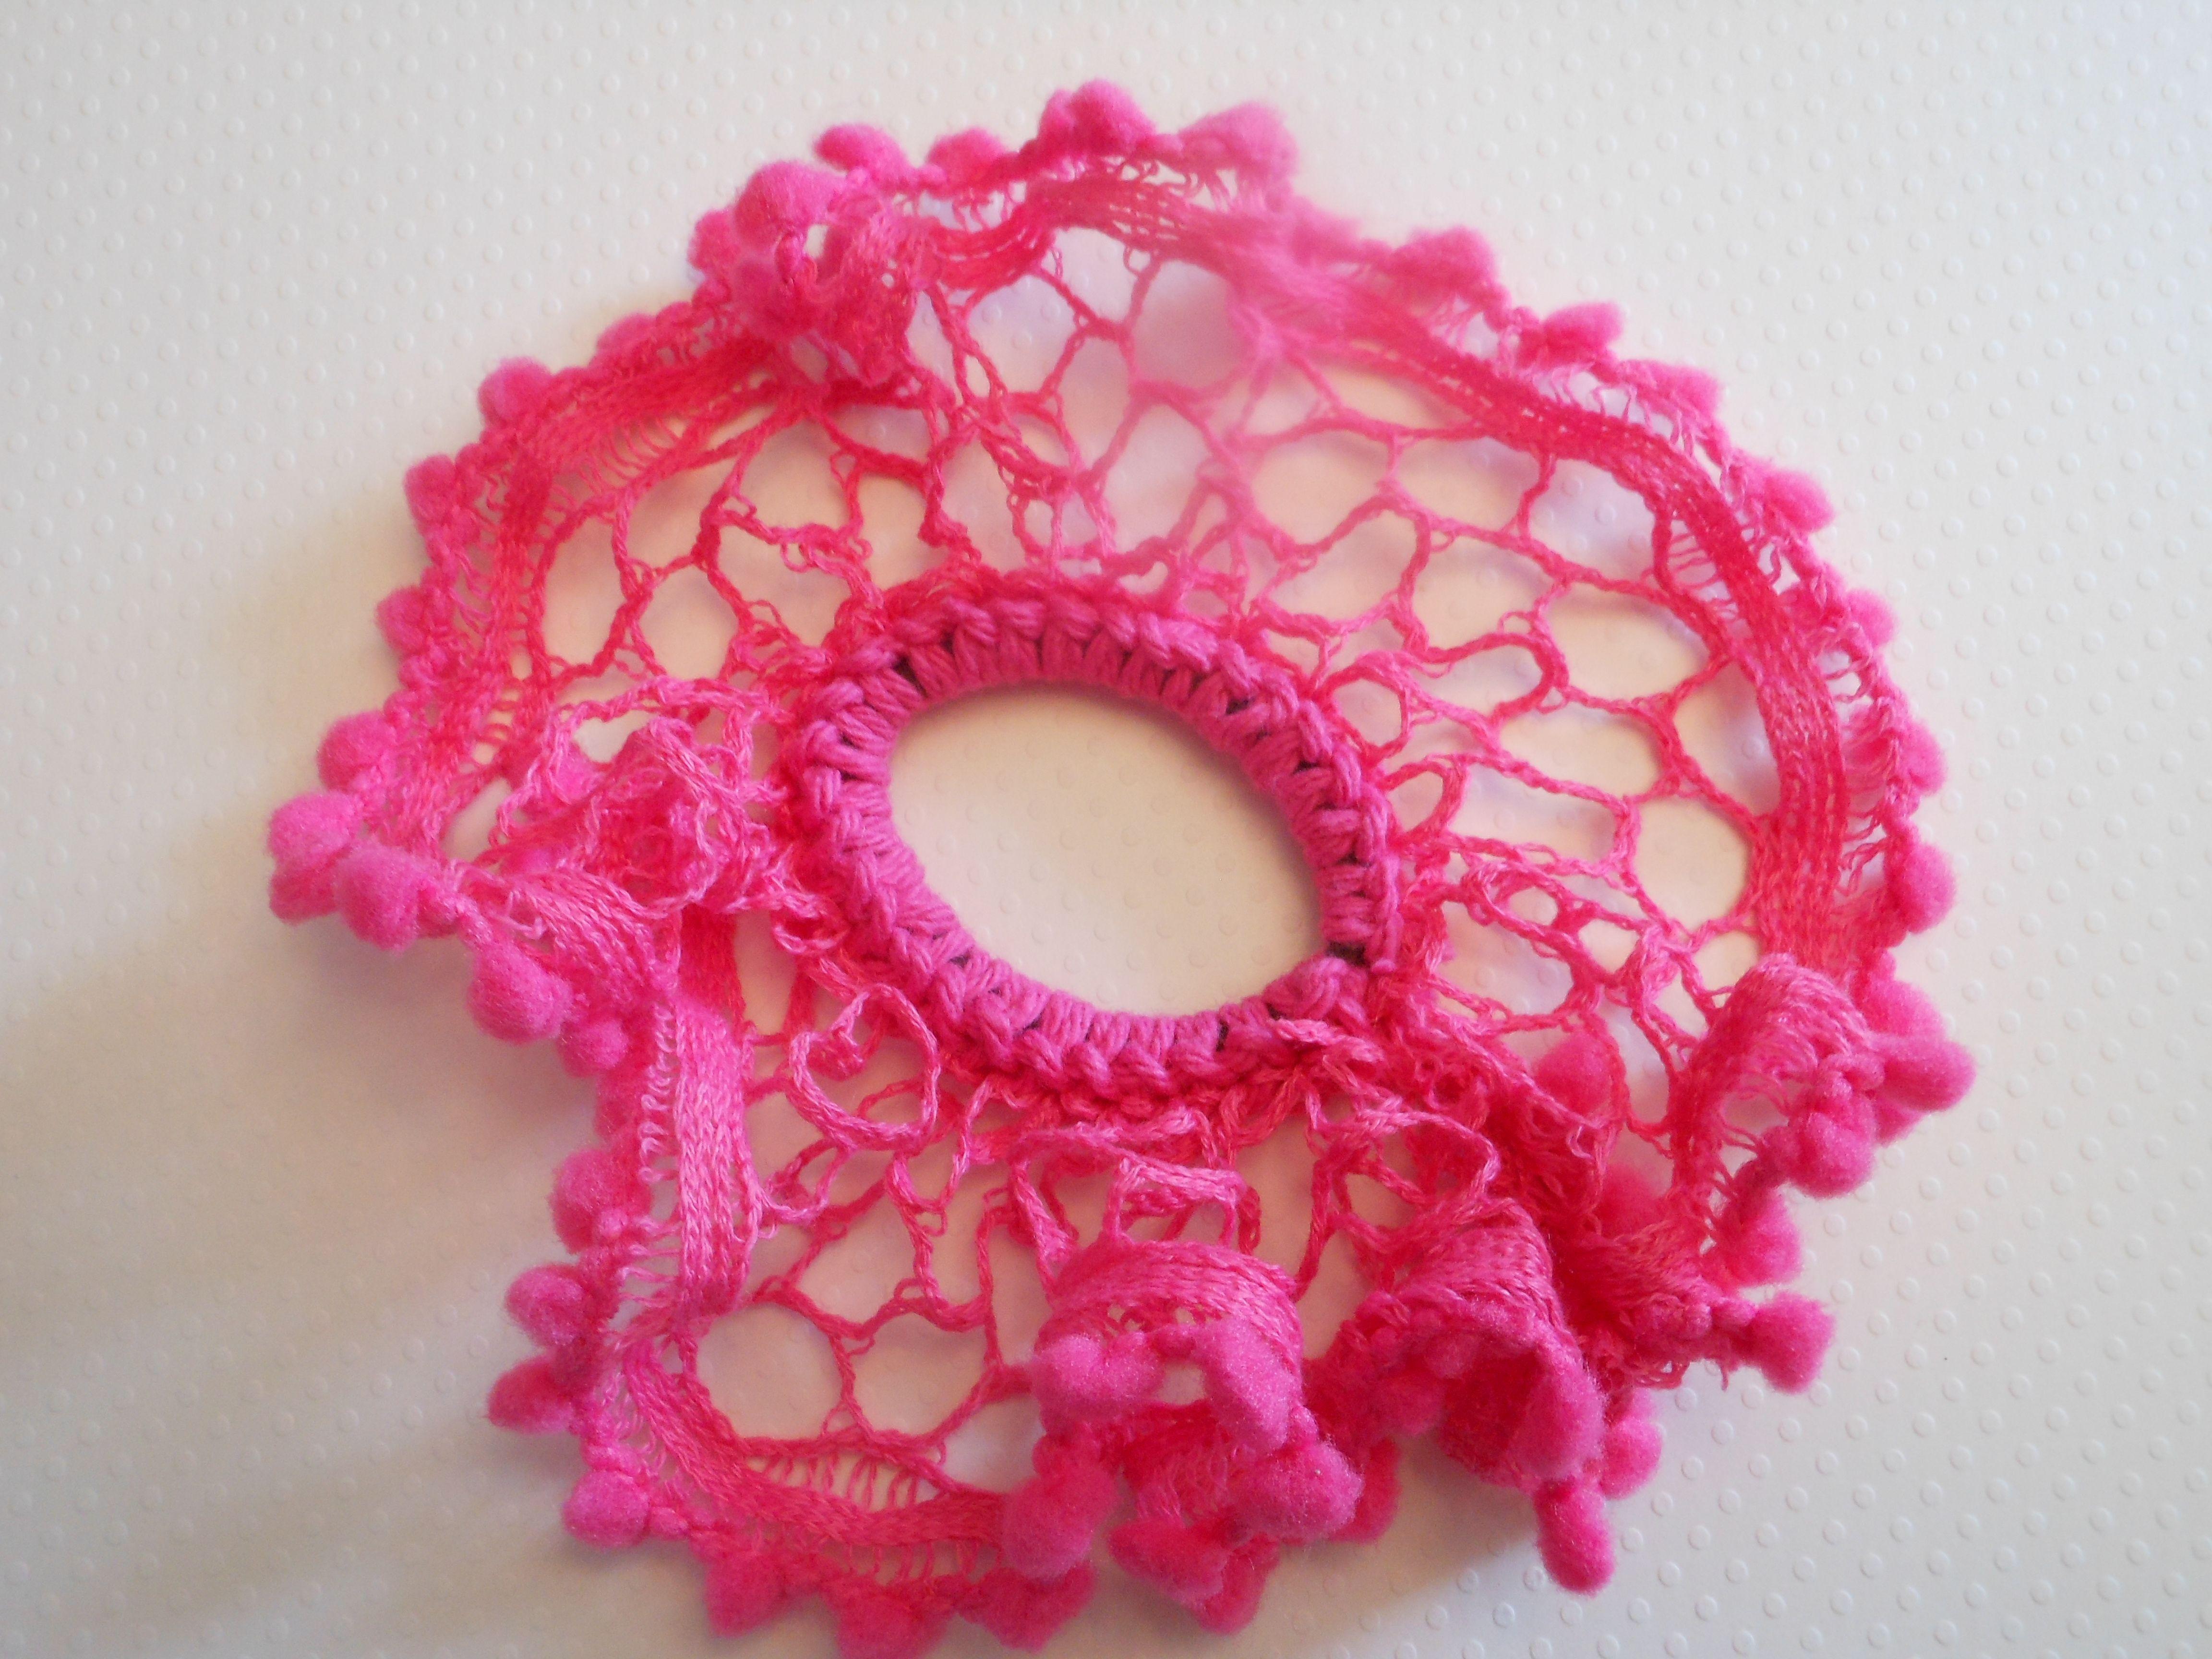 Hand crocheted scrunchie   crochet   Pinterest   Crochet, Stitch and ...